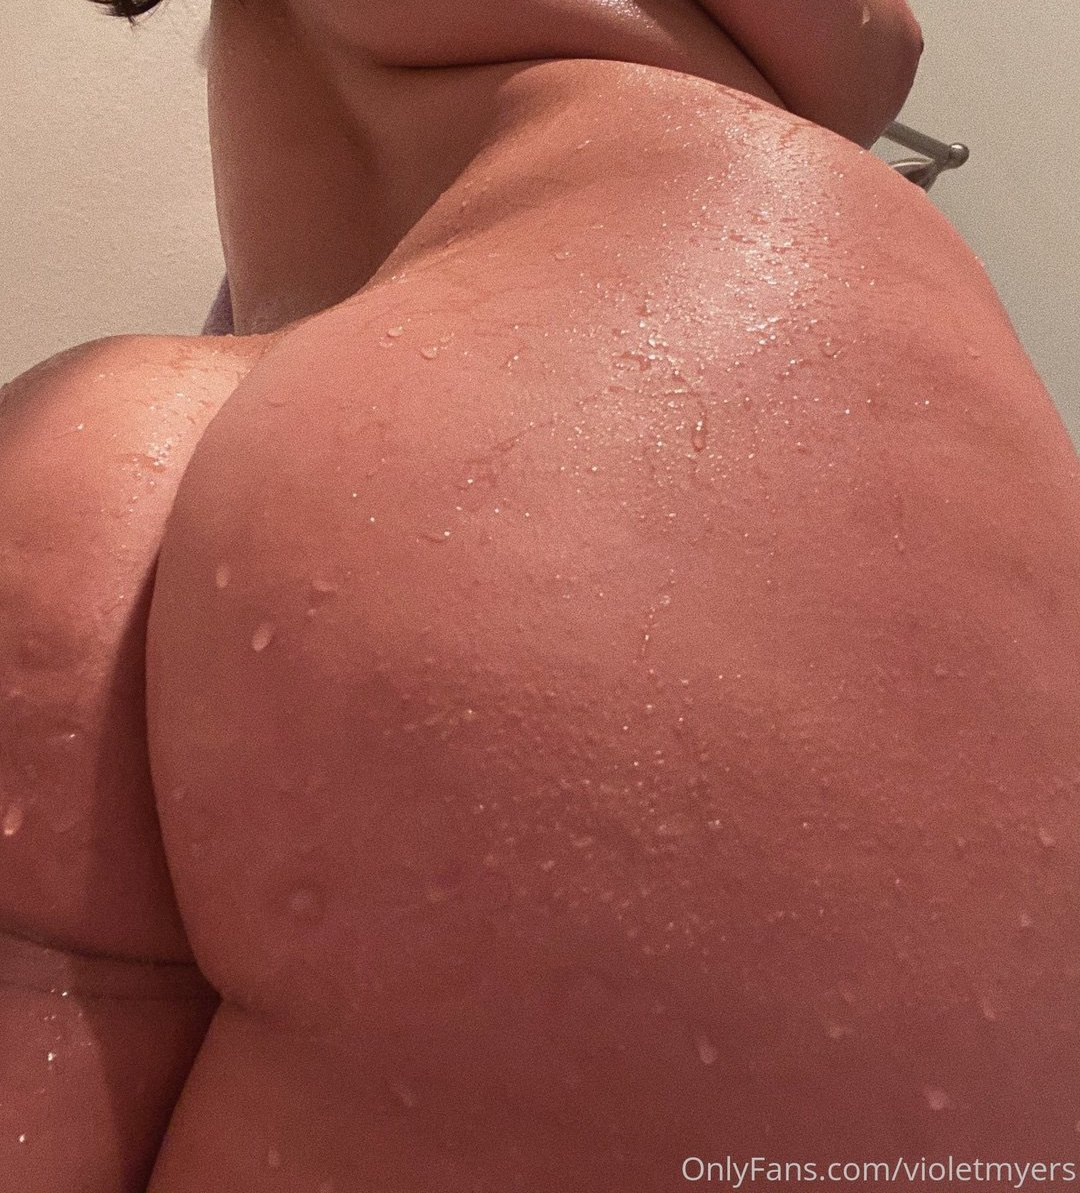 Violet Myers Violetmyers Onlyfans Nudes Leaks 0005